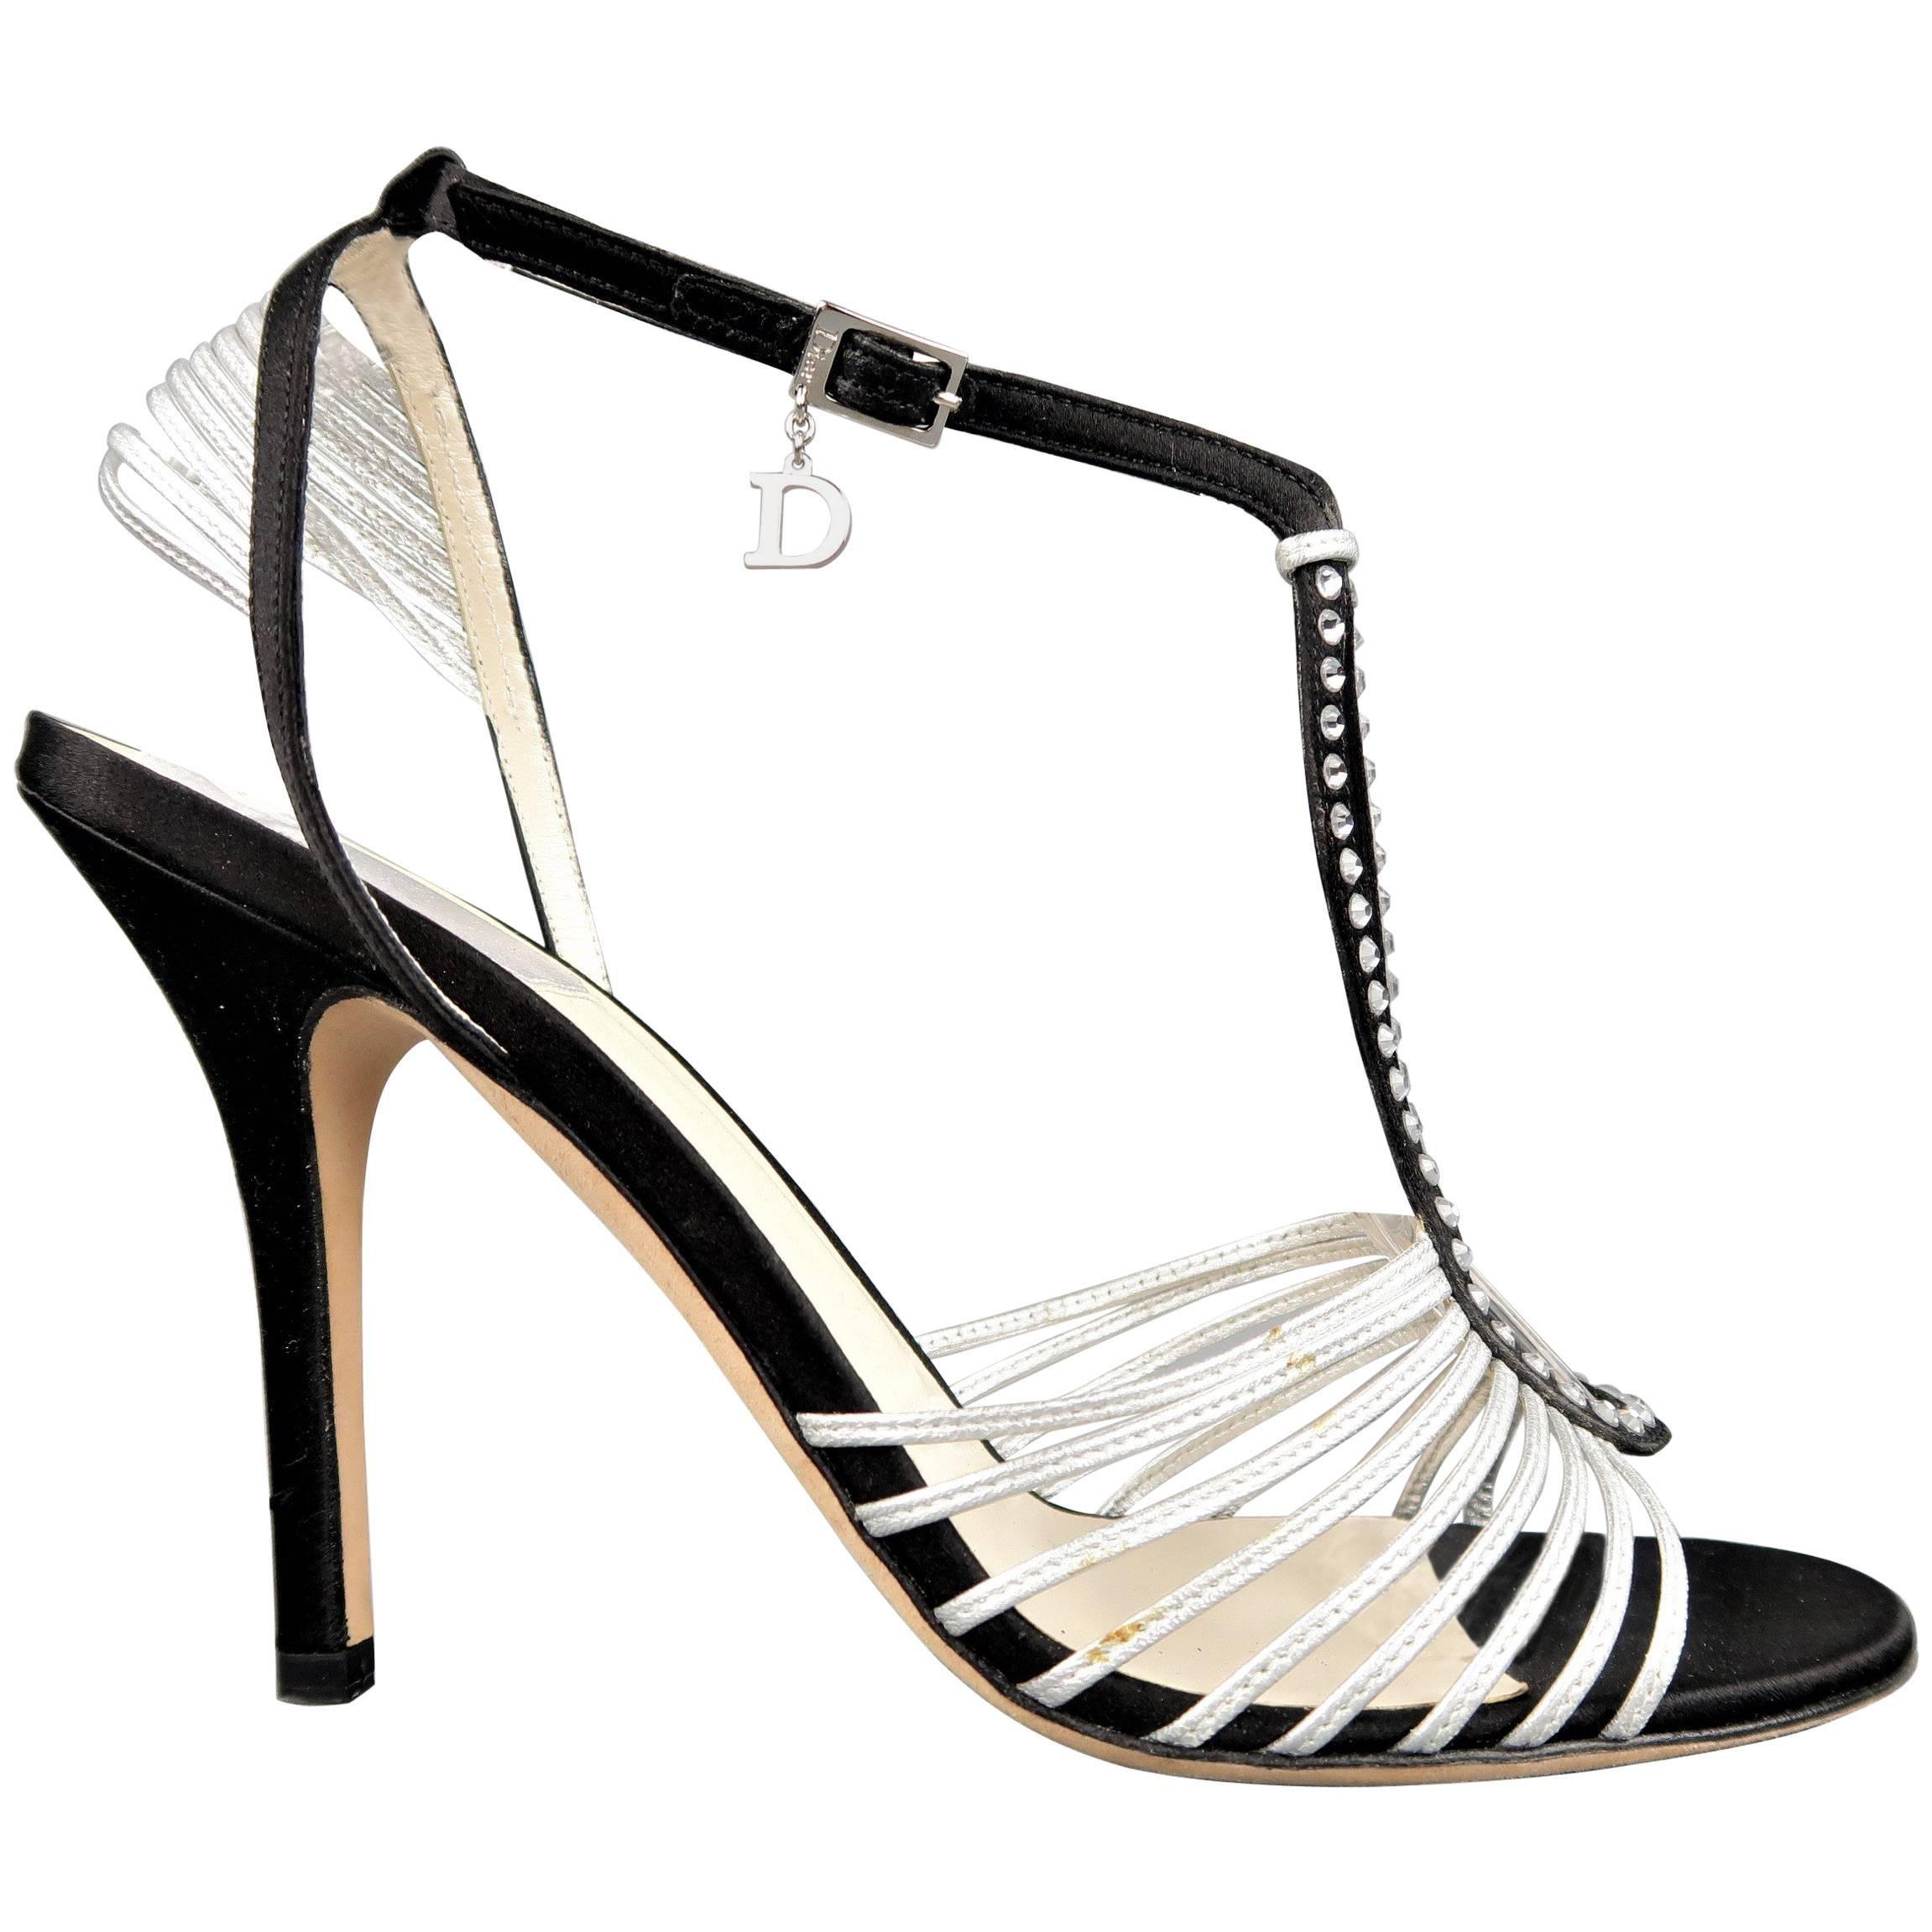 CHRISTIAN DIOR Size 9.5 Black & Silver Silk & Leather Rhinestone T Strap Sandals